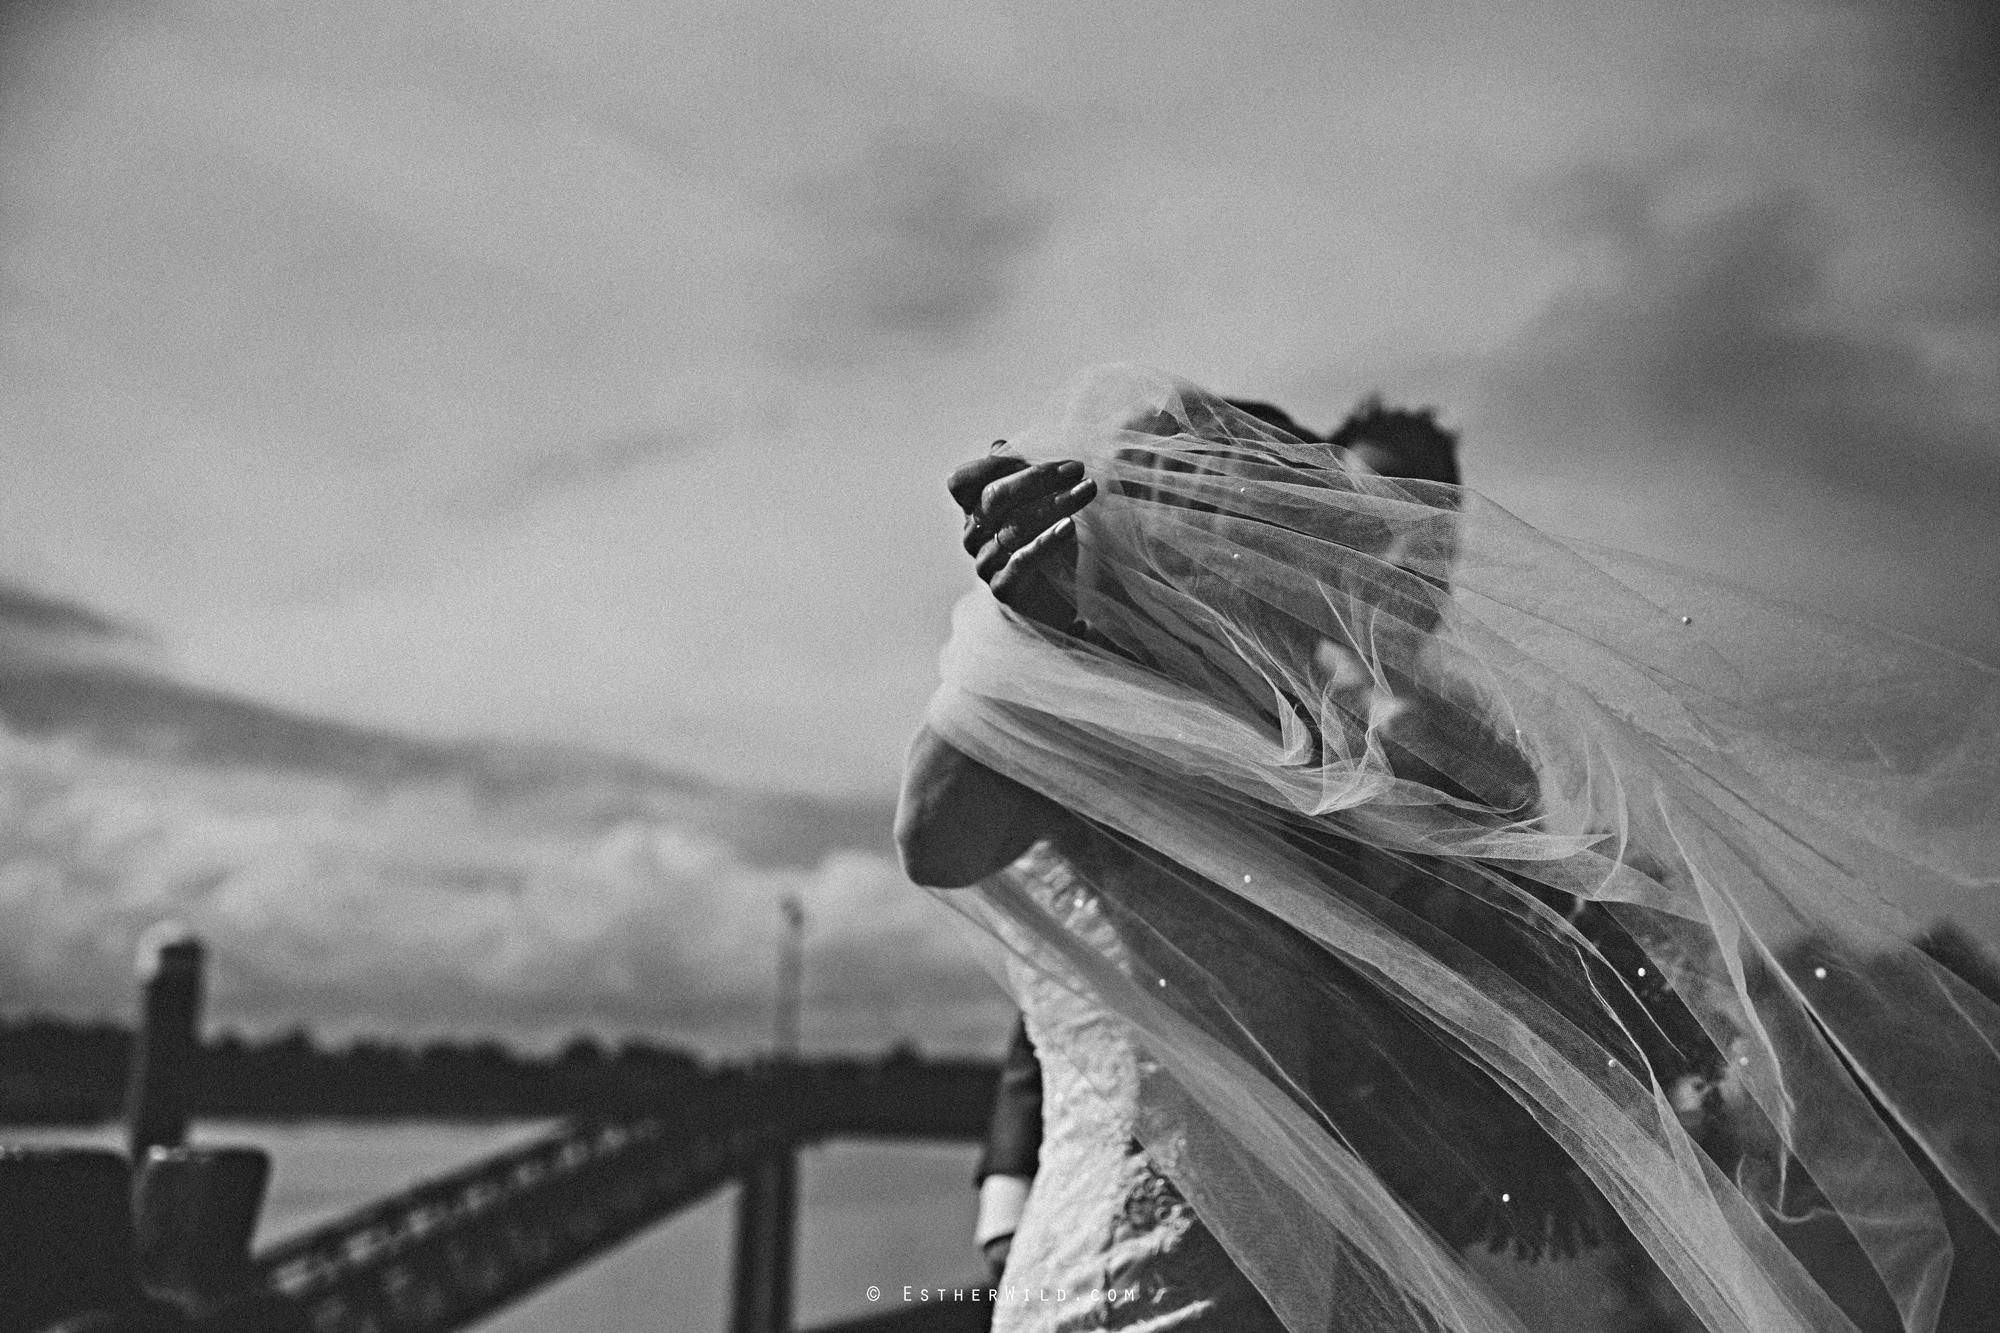 0817_Rathskellar_Kings_Lynn_East_Lexham_Church_Wedding_Photographer_Esther_Wild_IMG_1531-1.jpg